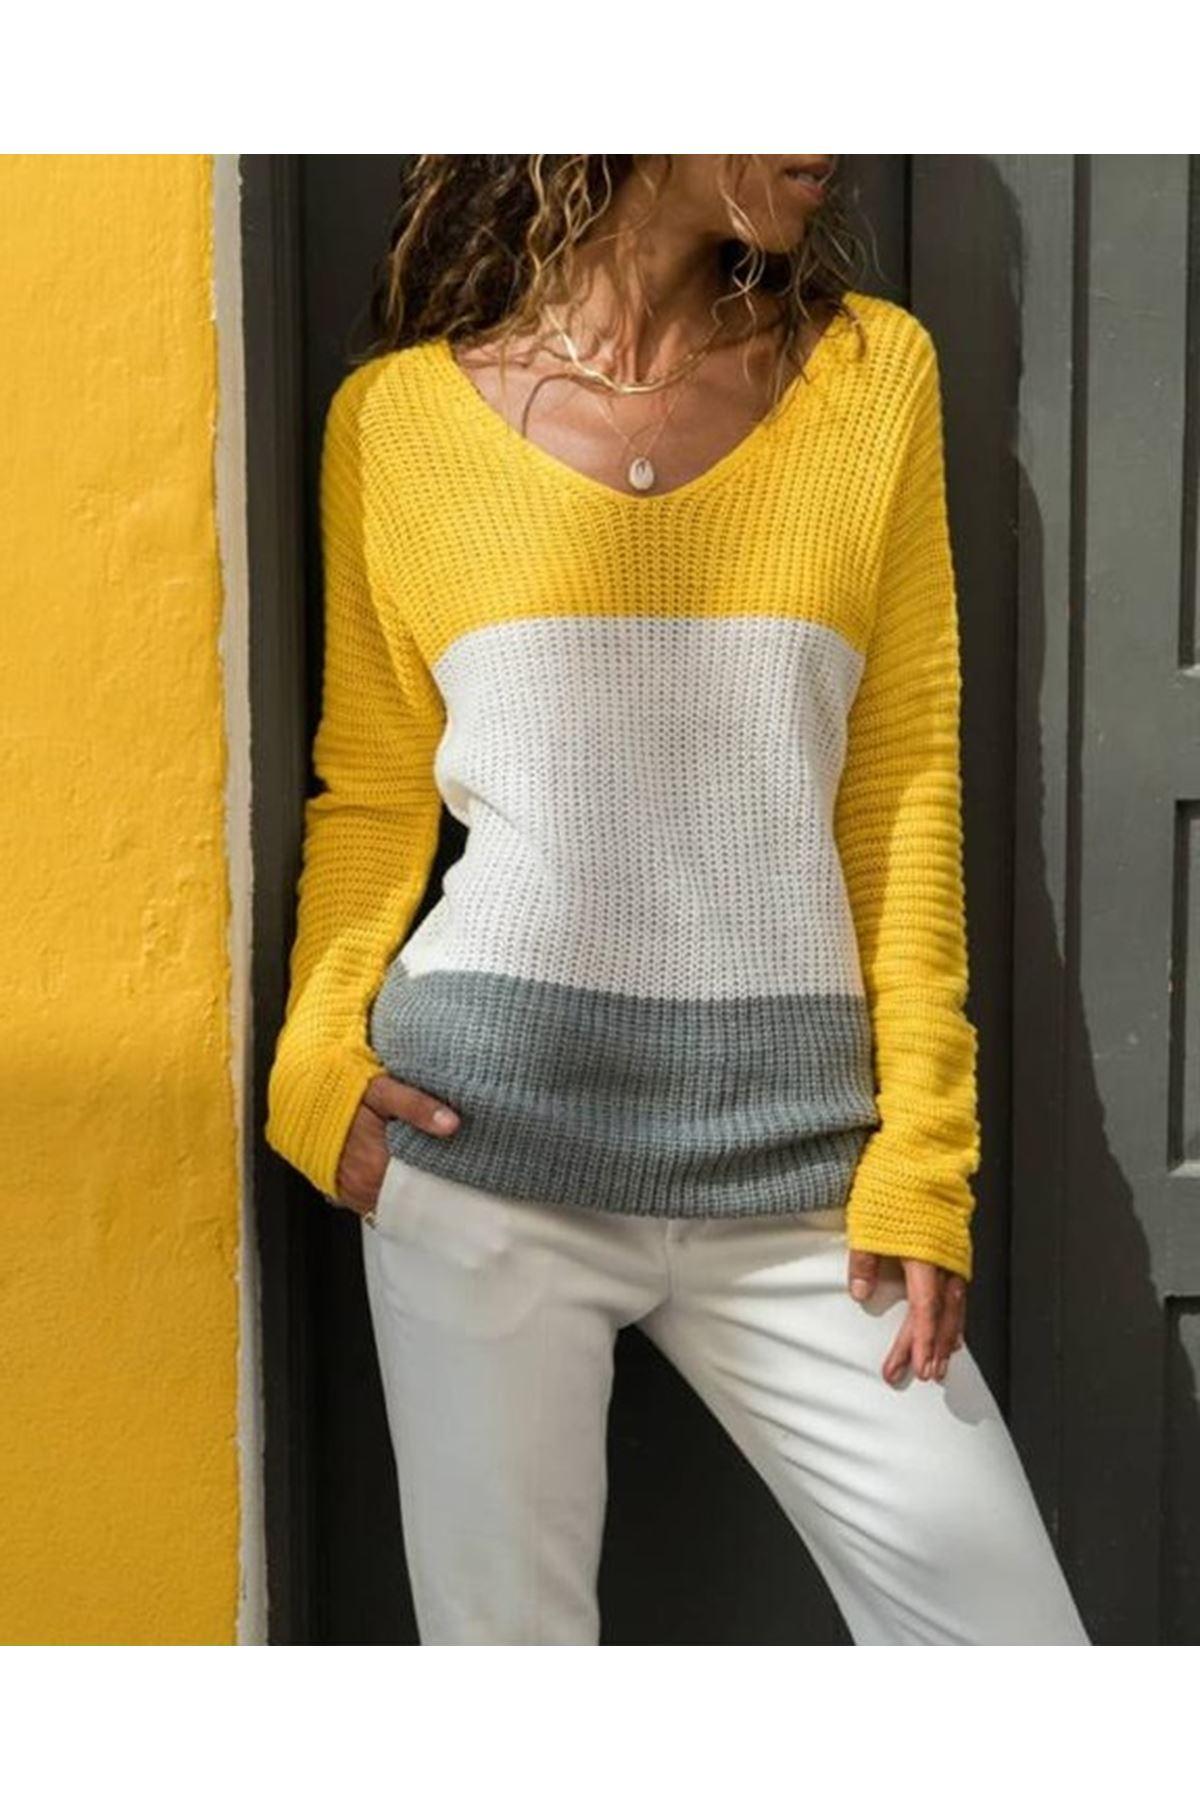 Renk Geçiş Triko Kazak - sarı